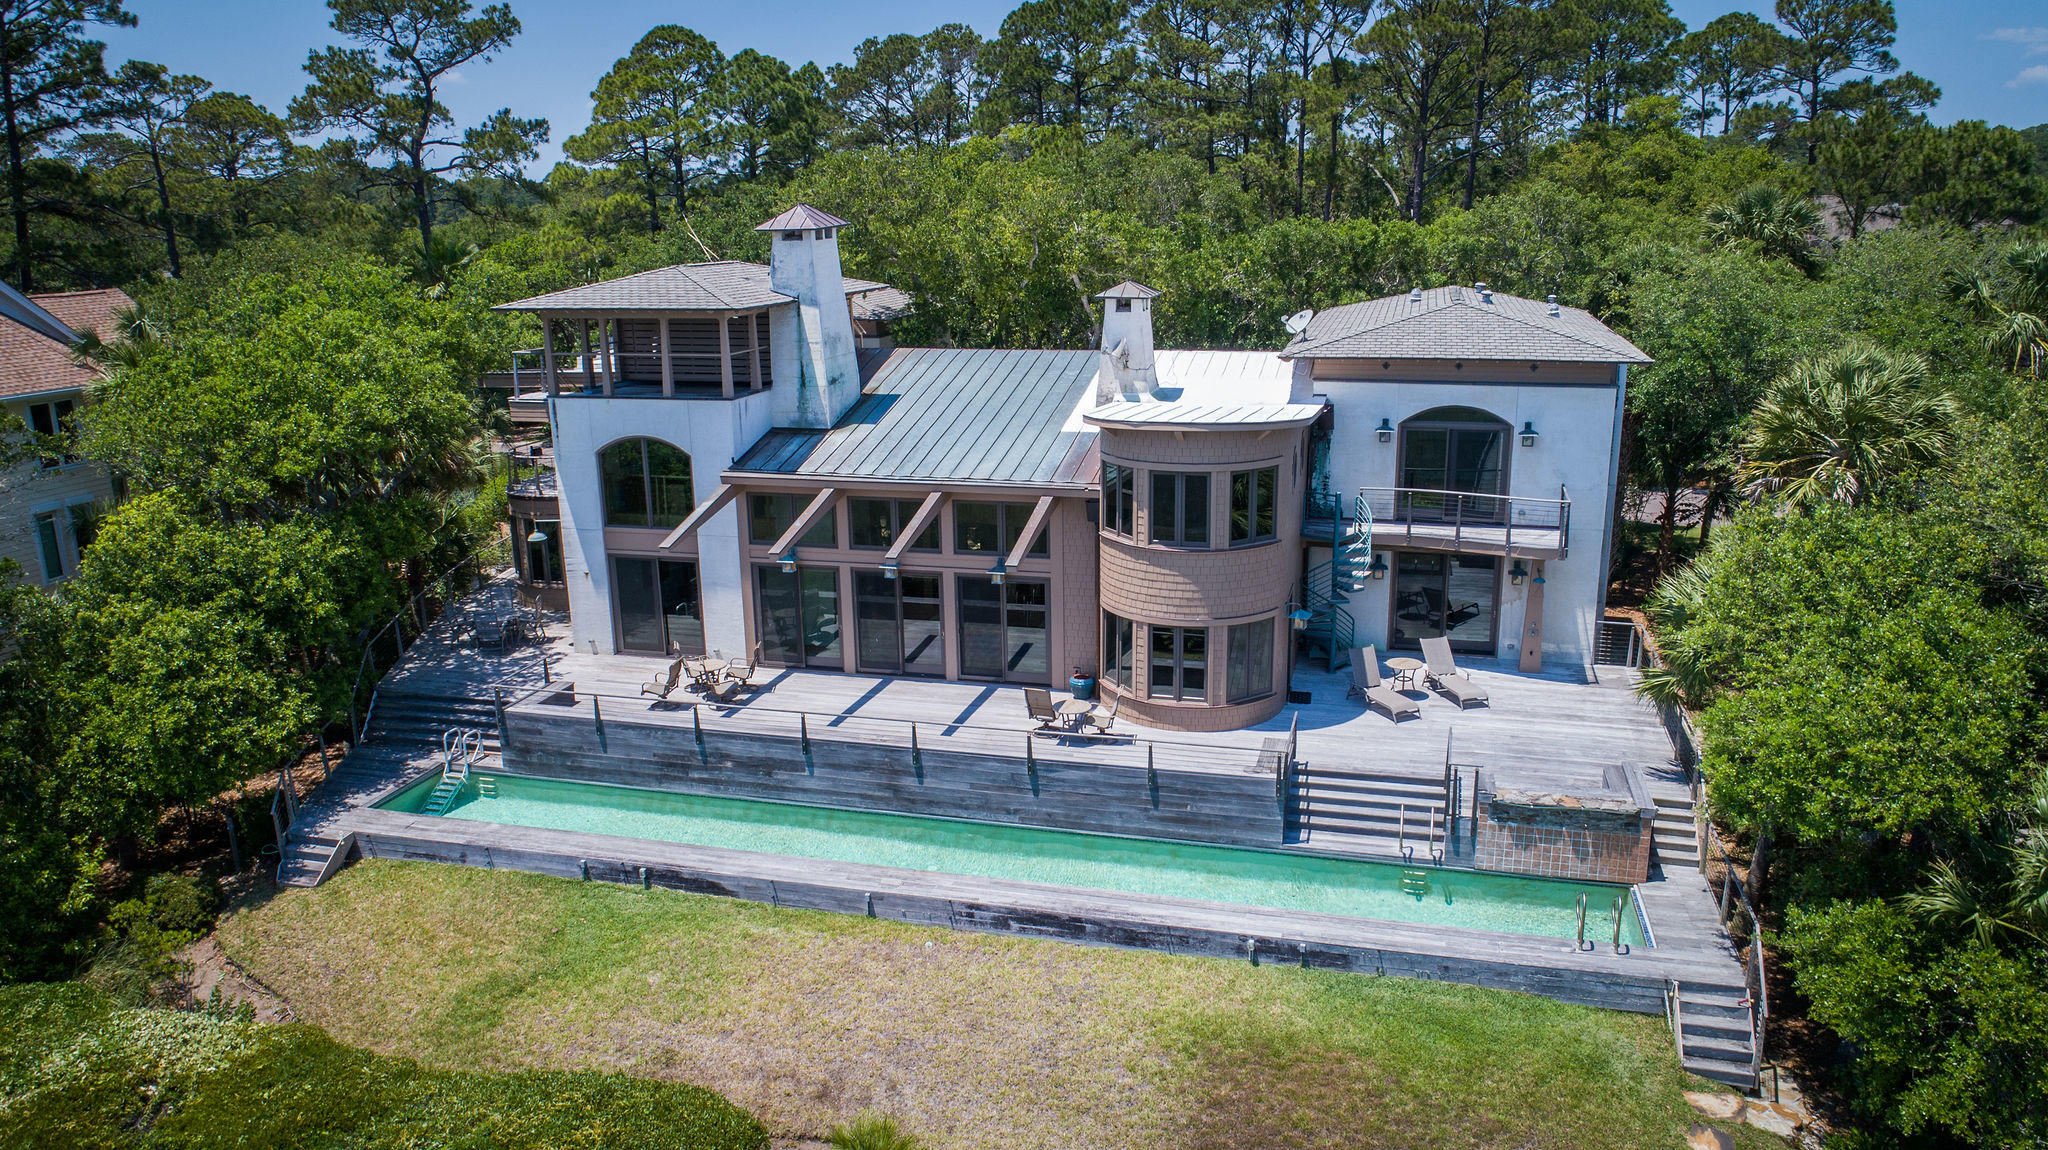 Seabrook Island Homes For Sale - 3087 Marshgate, Seabrook Island, SC - 30